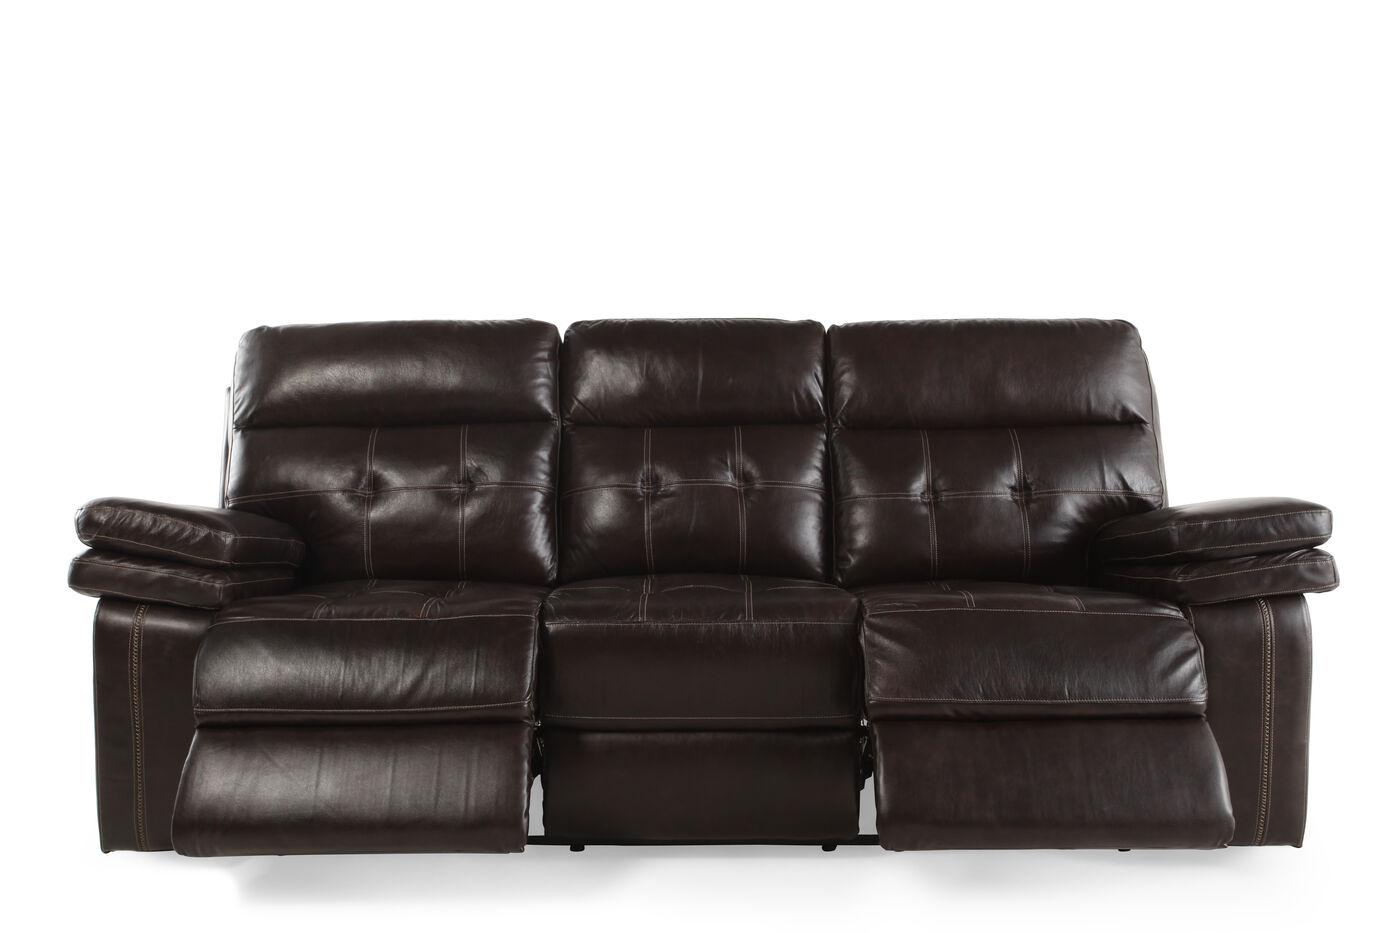 Verona Houston Brown Power Sofa Mathis Brothers Furniture